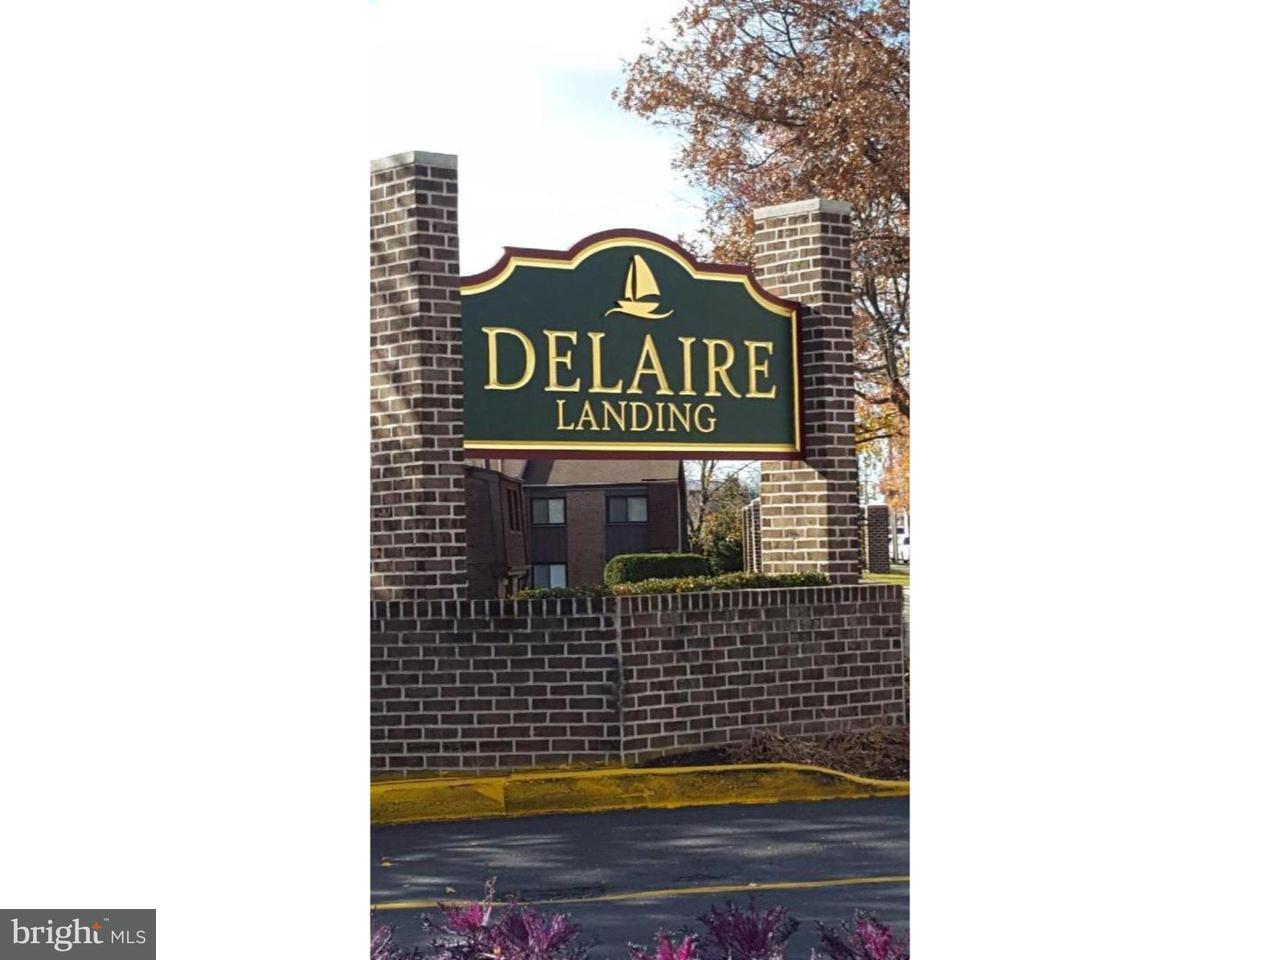 64001  Delaire Landing Philadelphia , PA 19114